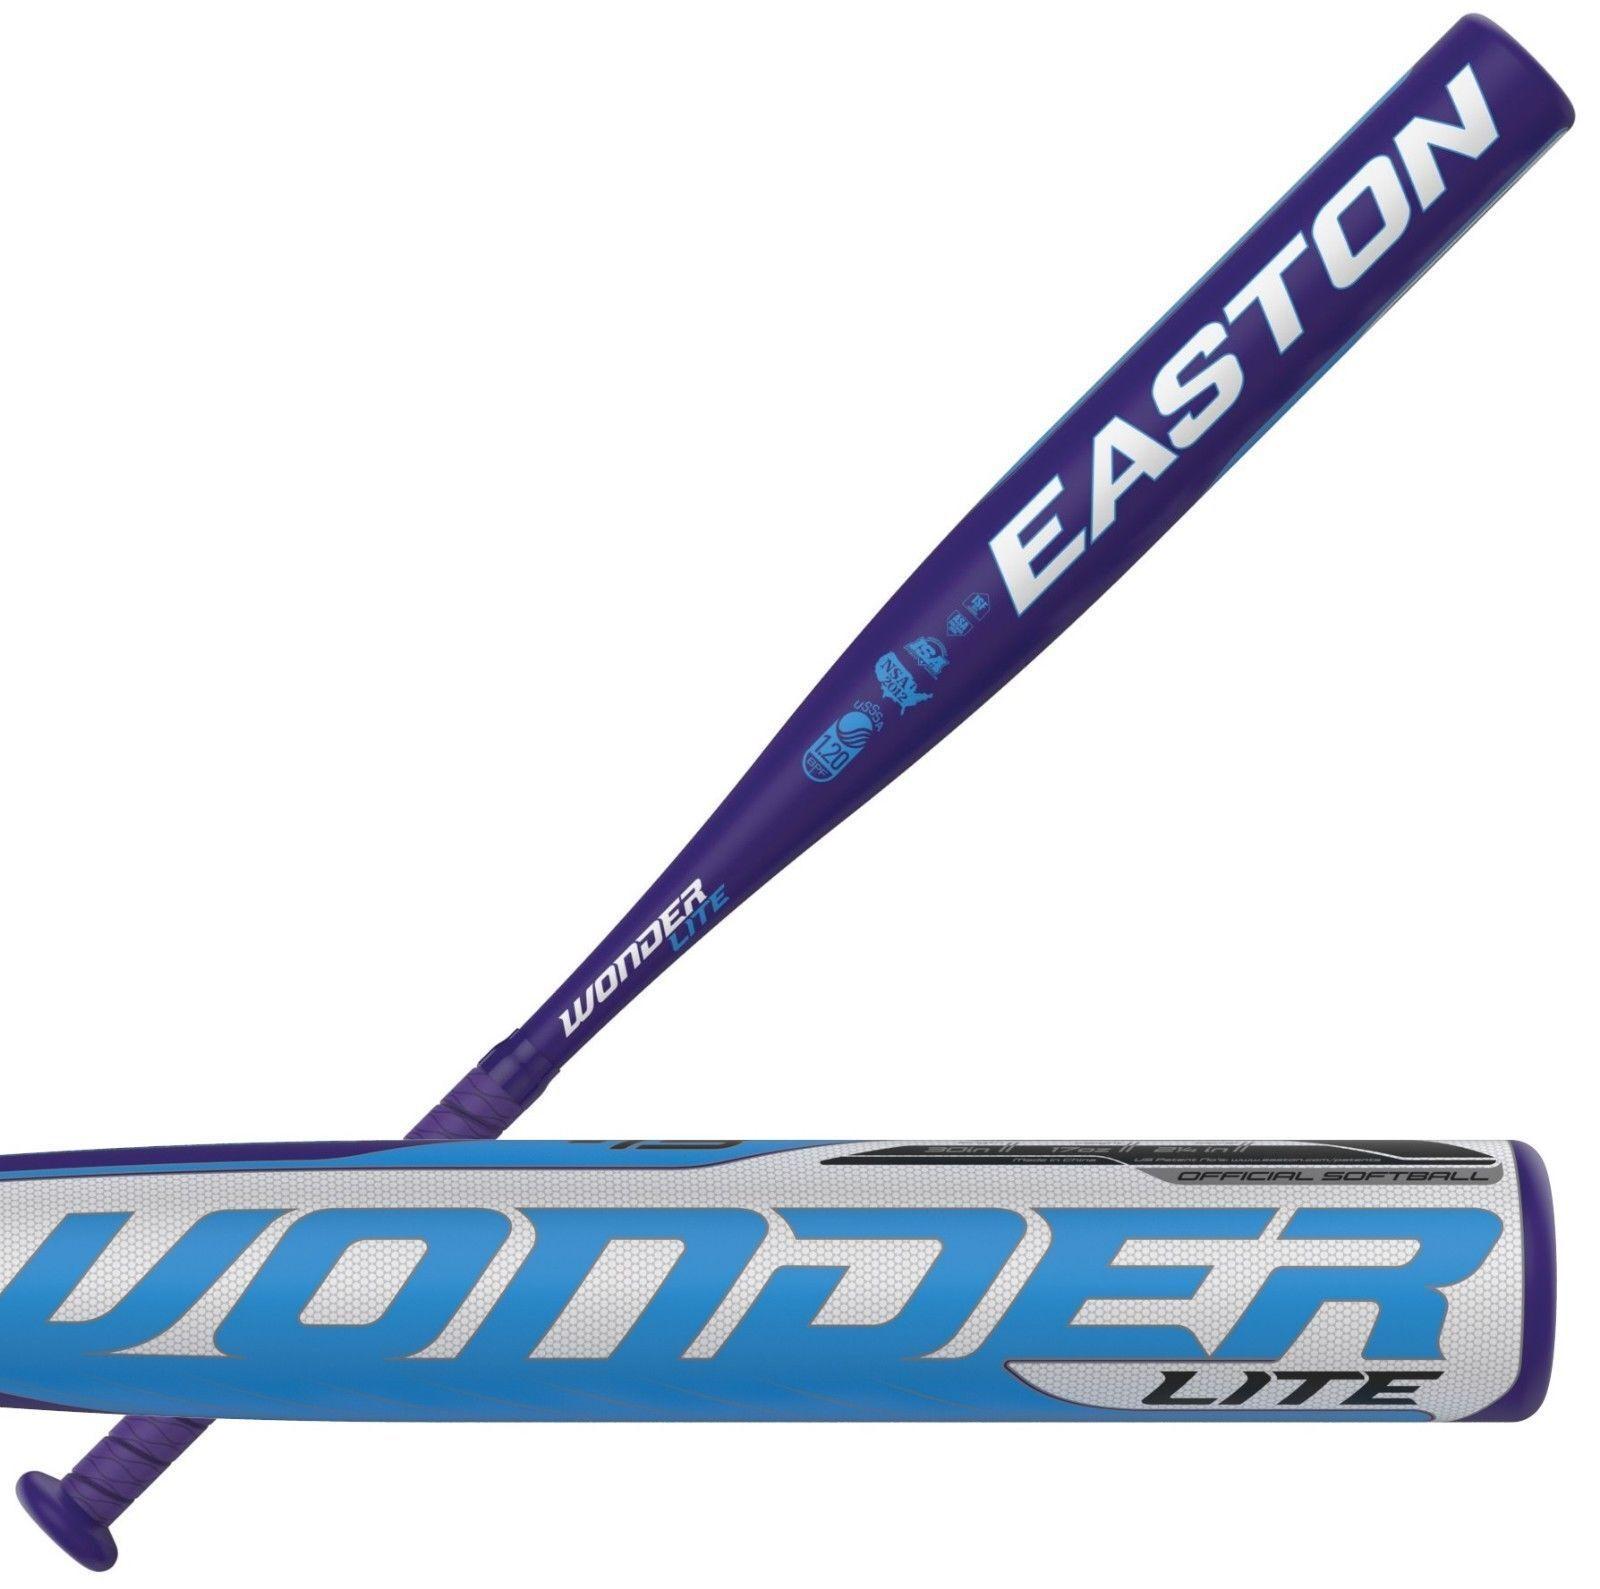 2019 Easton Wonderlite -13 30